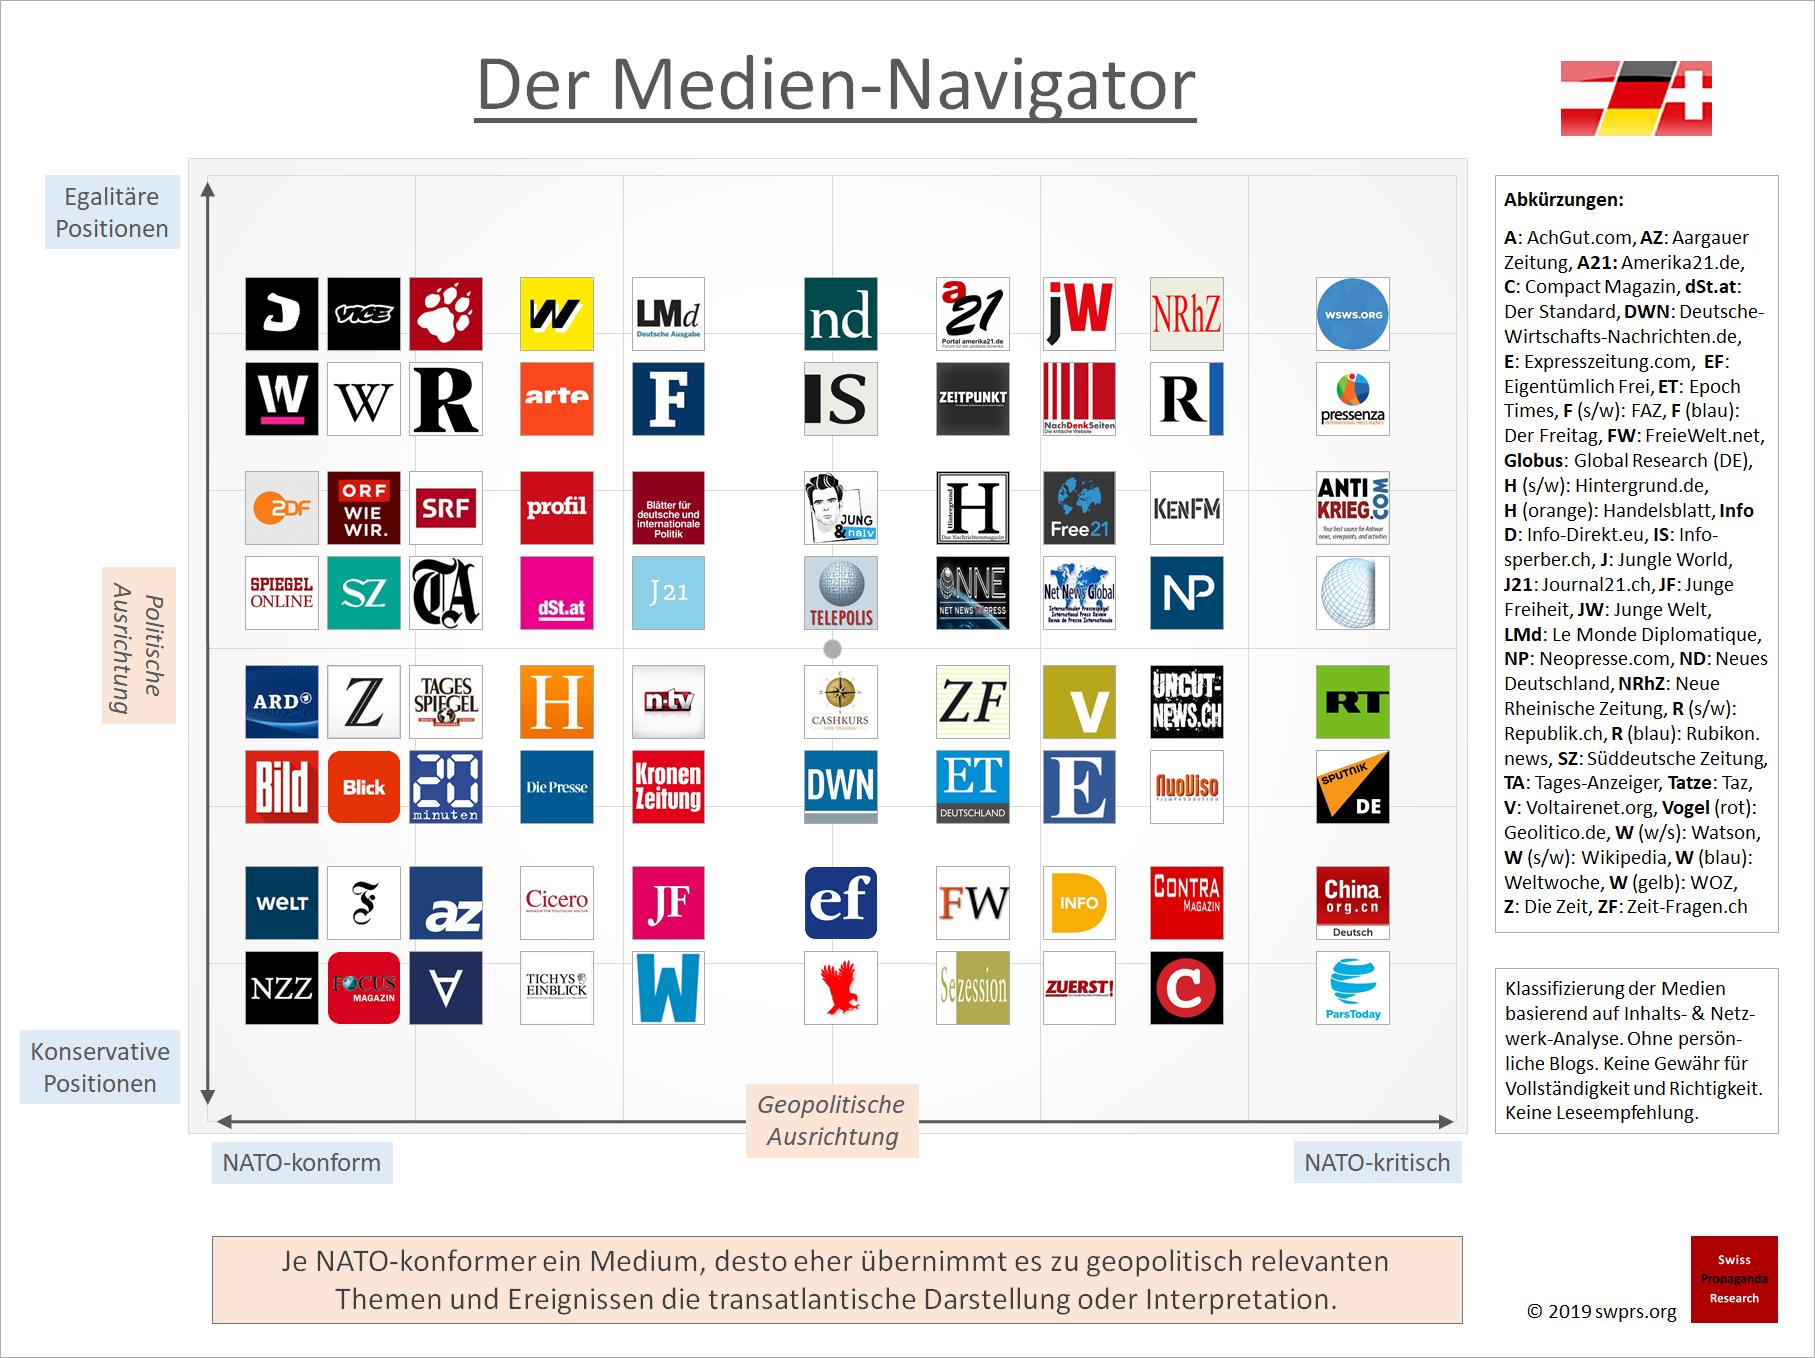 medien-navigator-2019.png